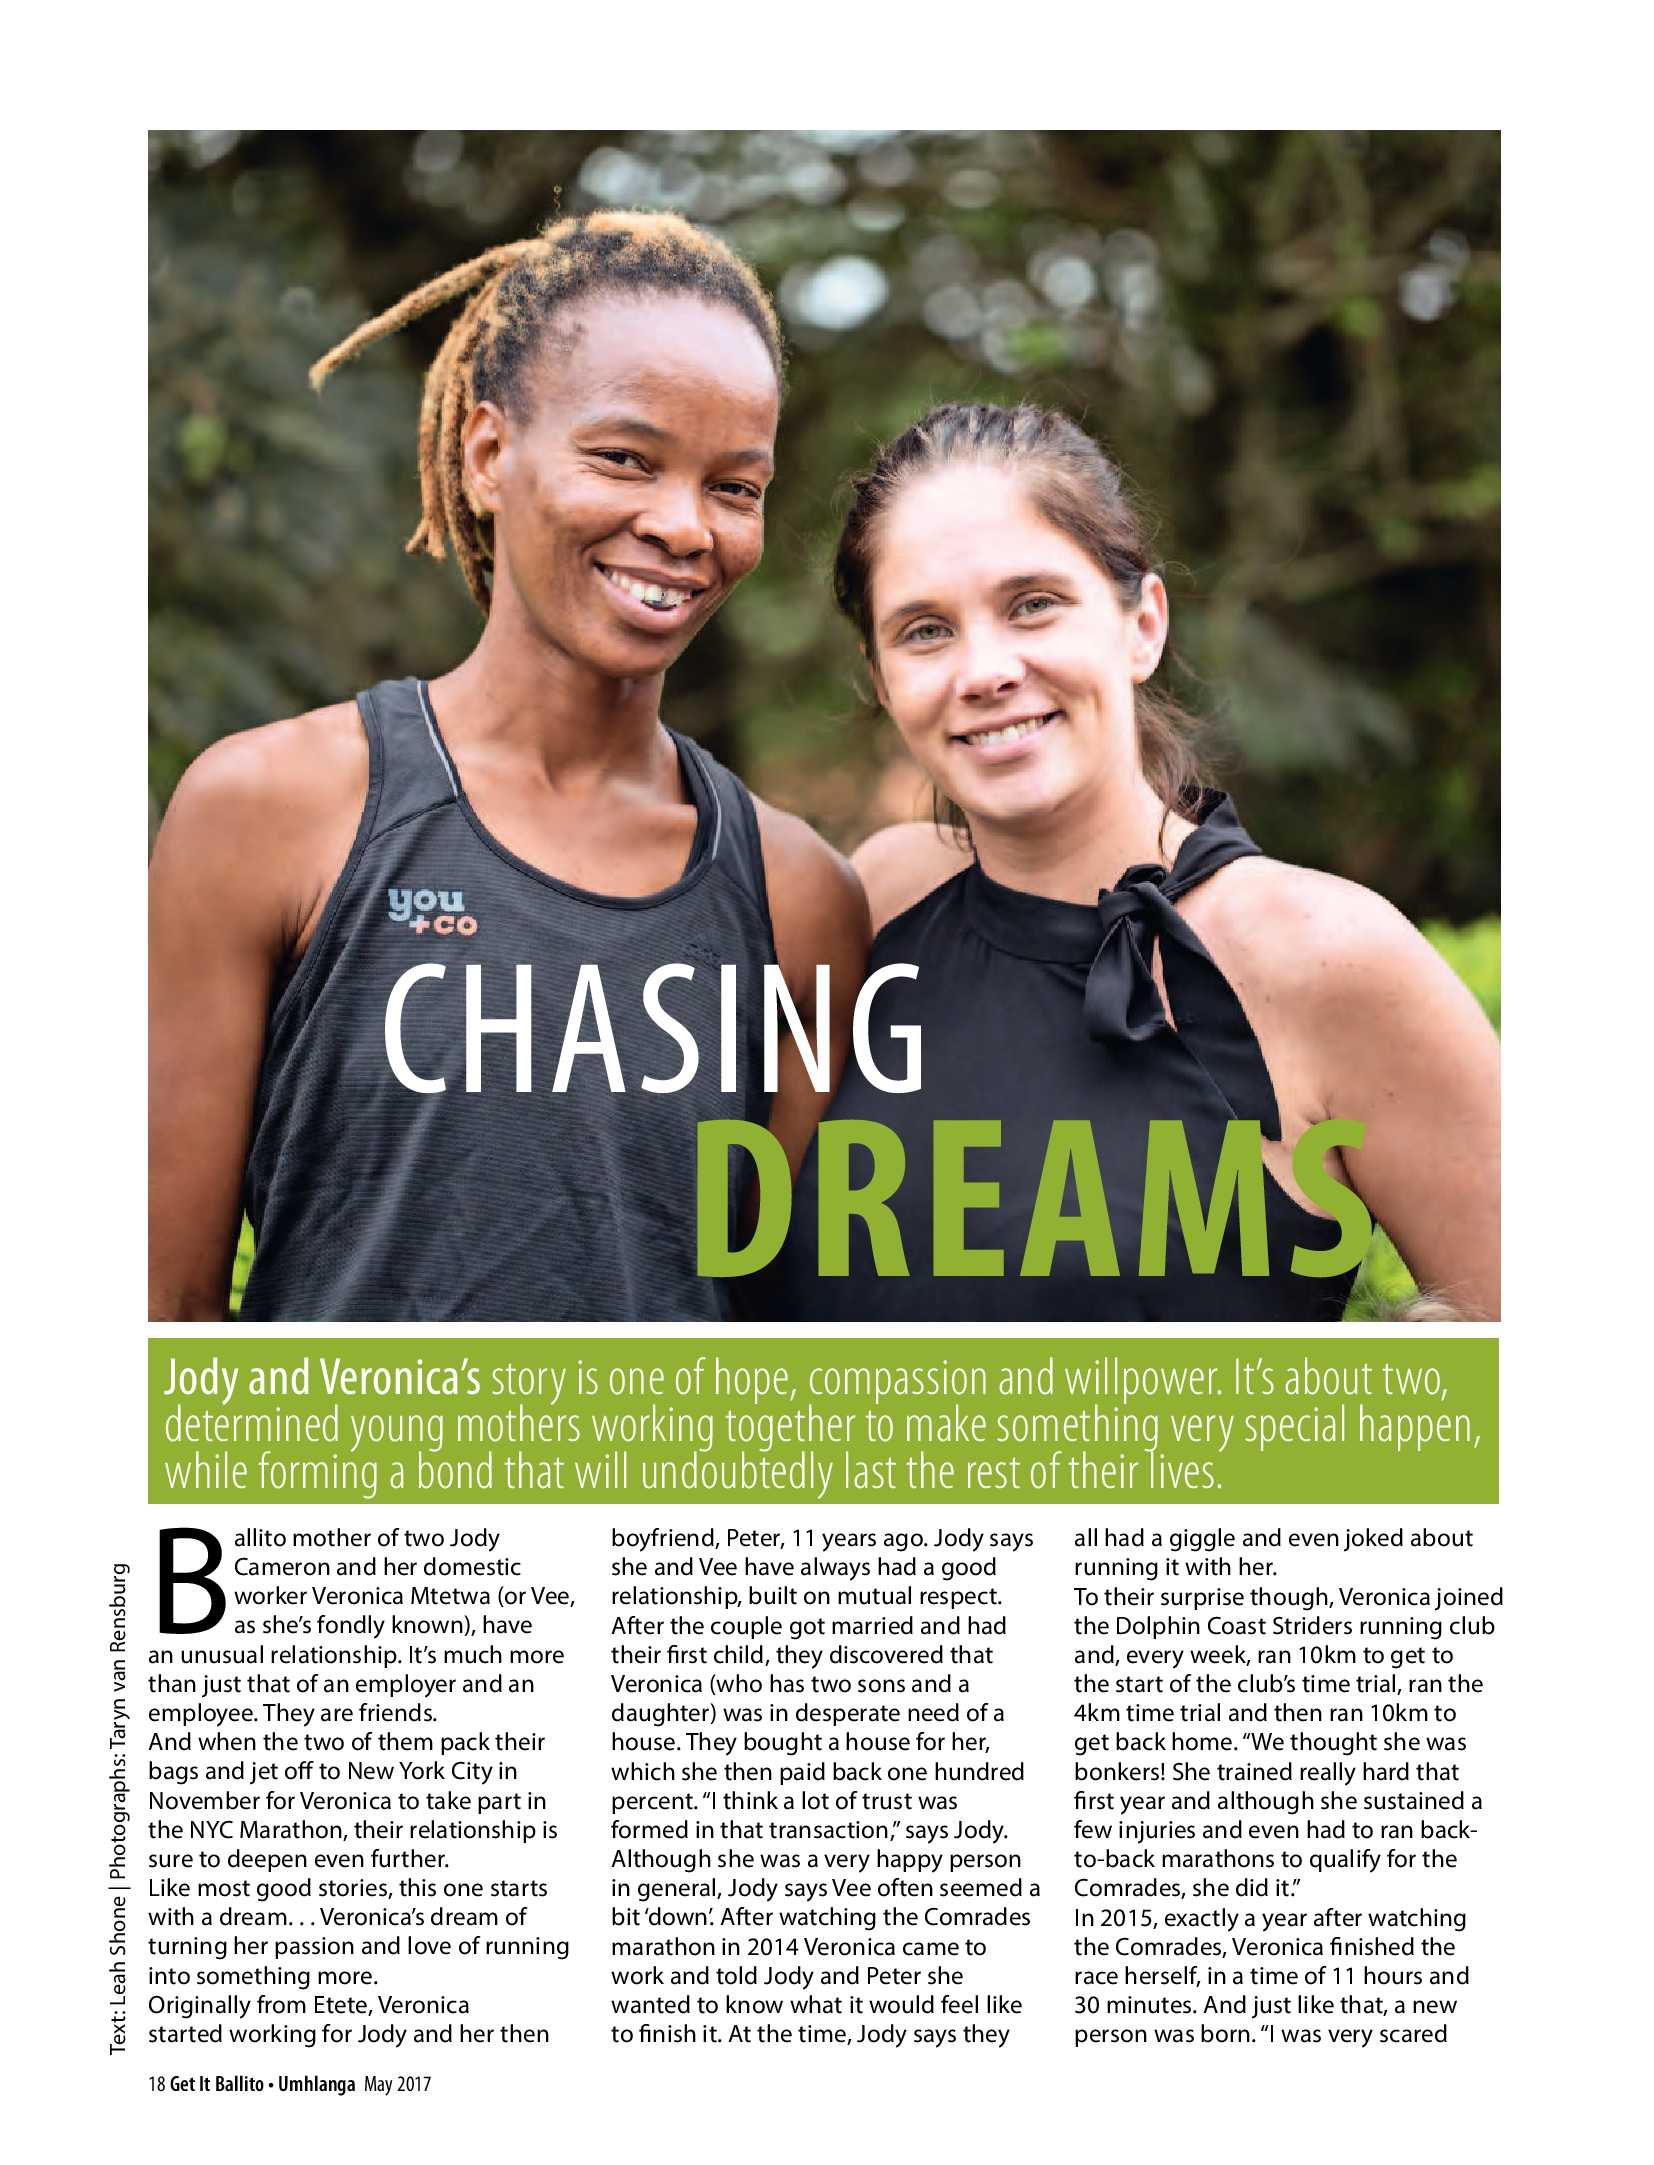 get-magazine-ballitoumhlanga-may-2017-epapers-page-20